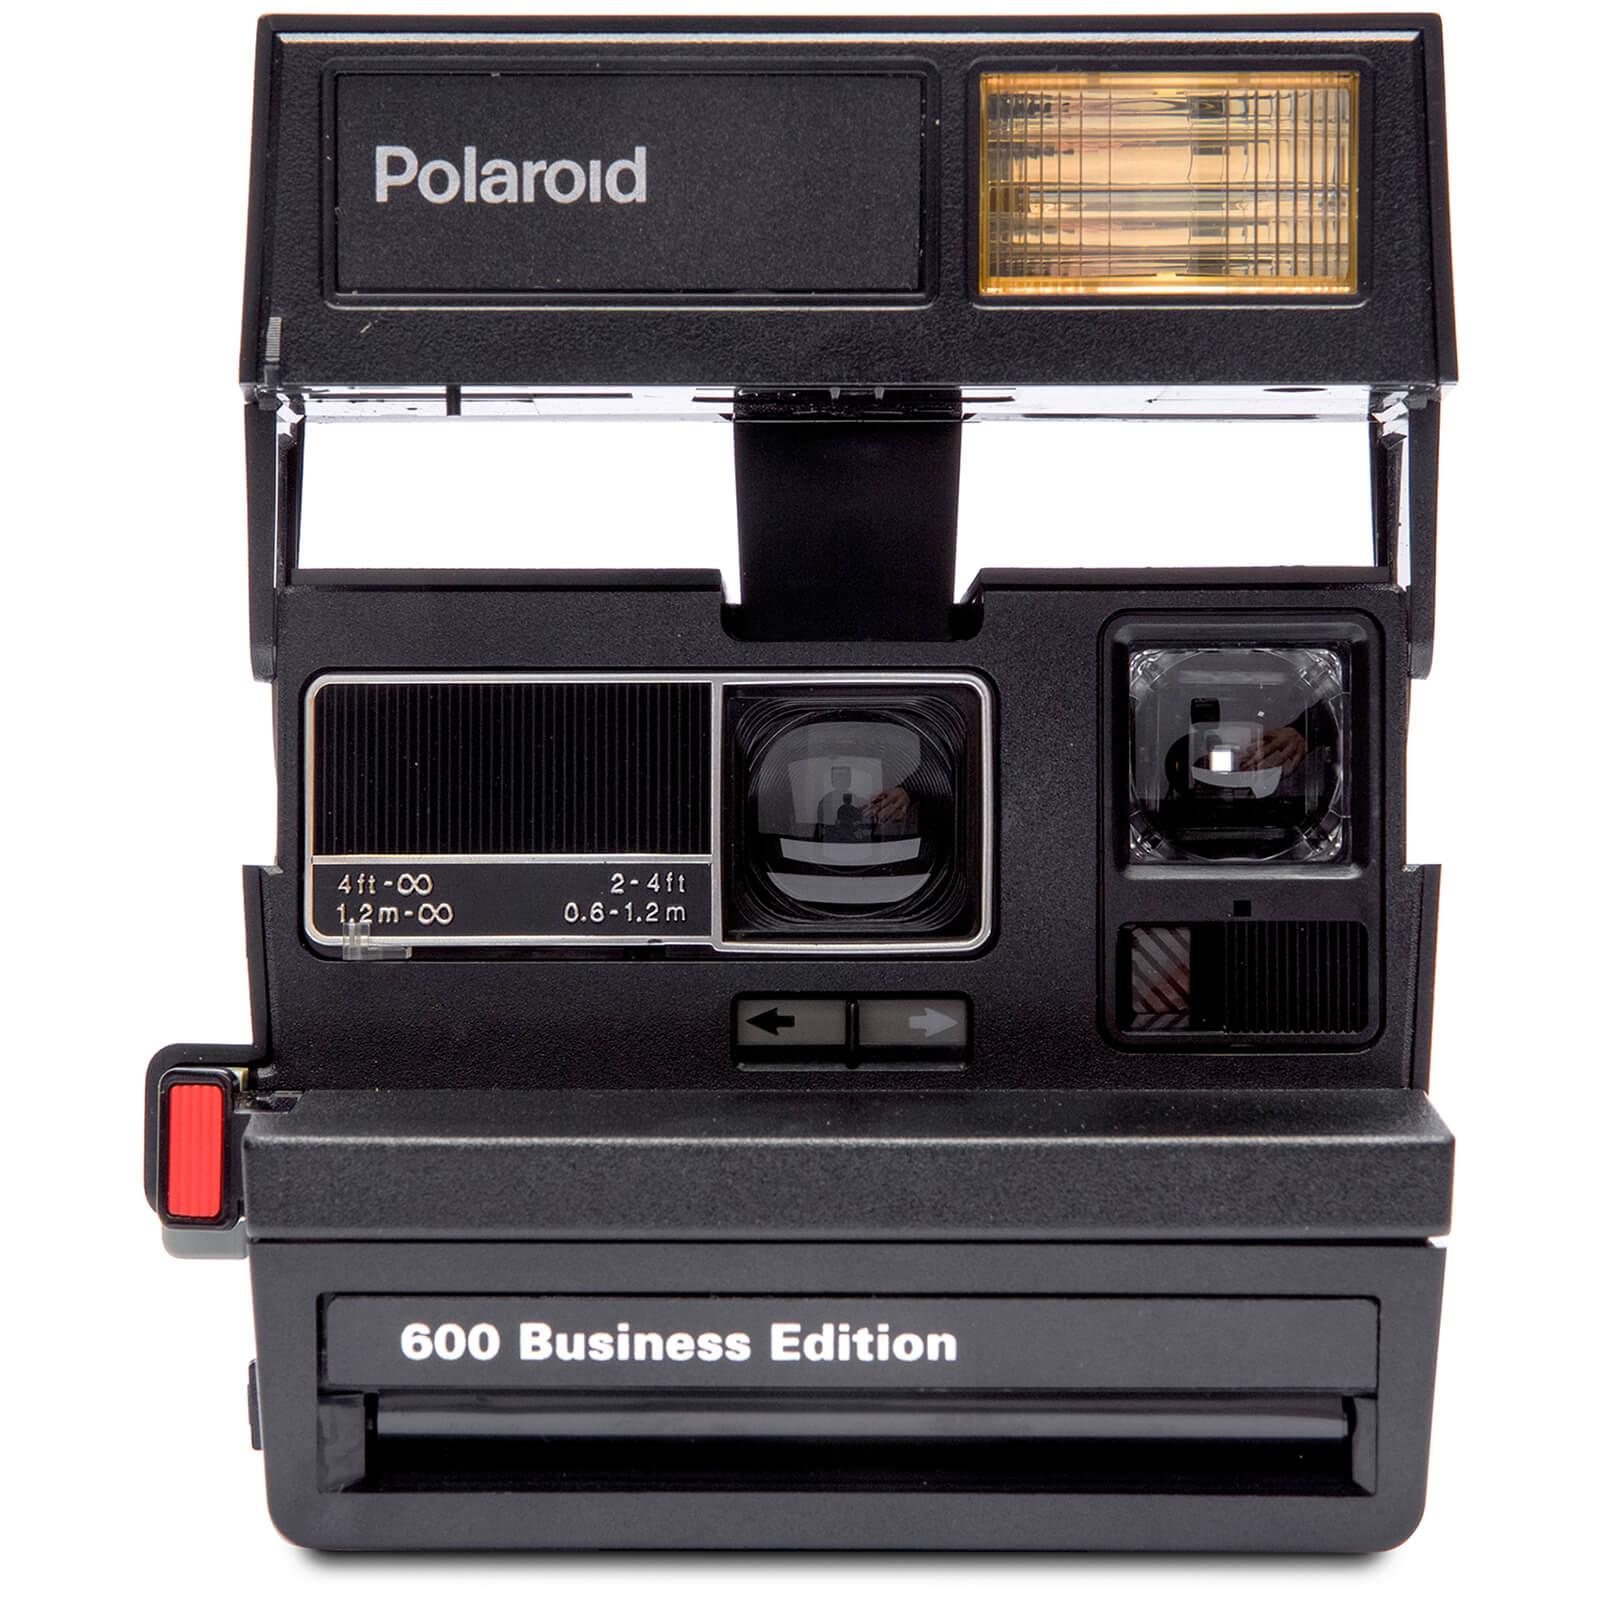 Polaroid 600 Camera - Square - Vintage Refurb - Grade A-